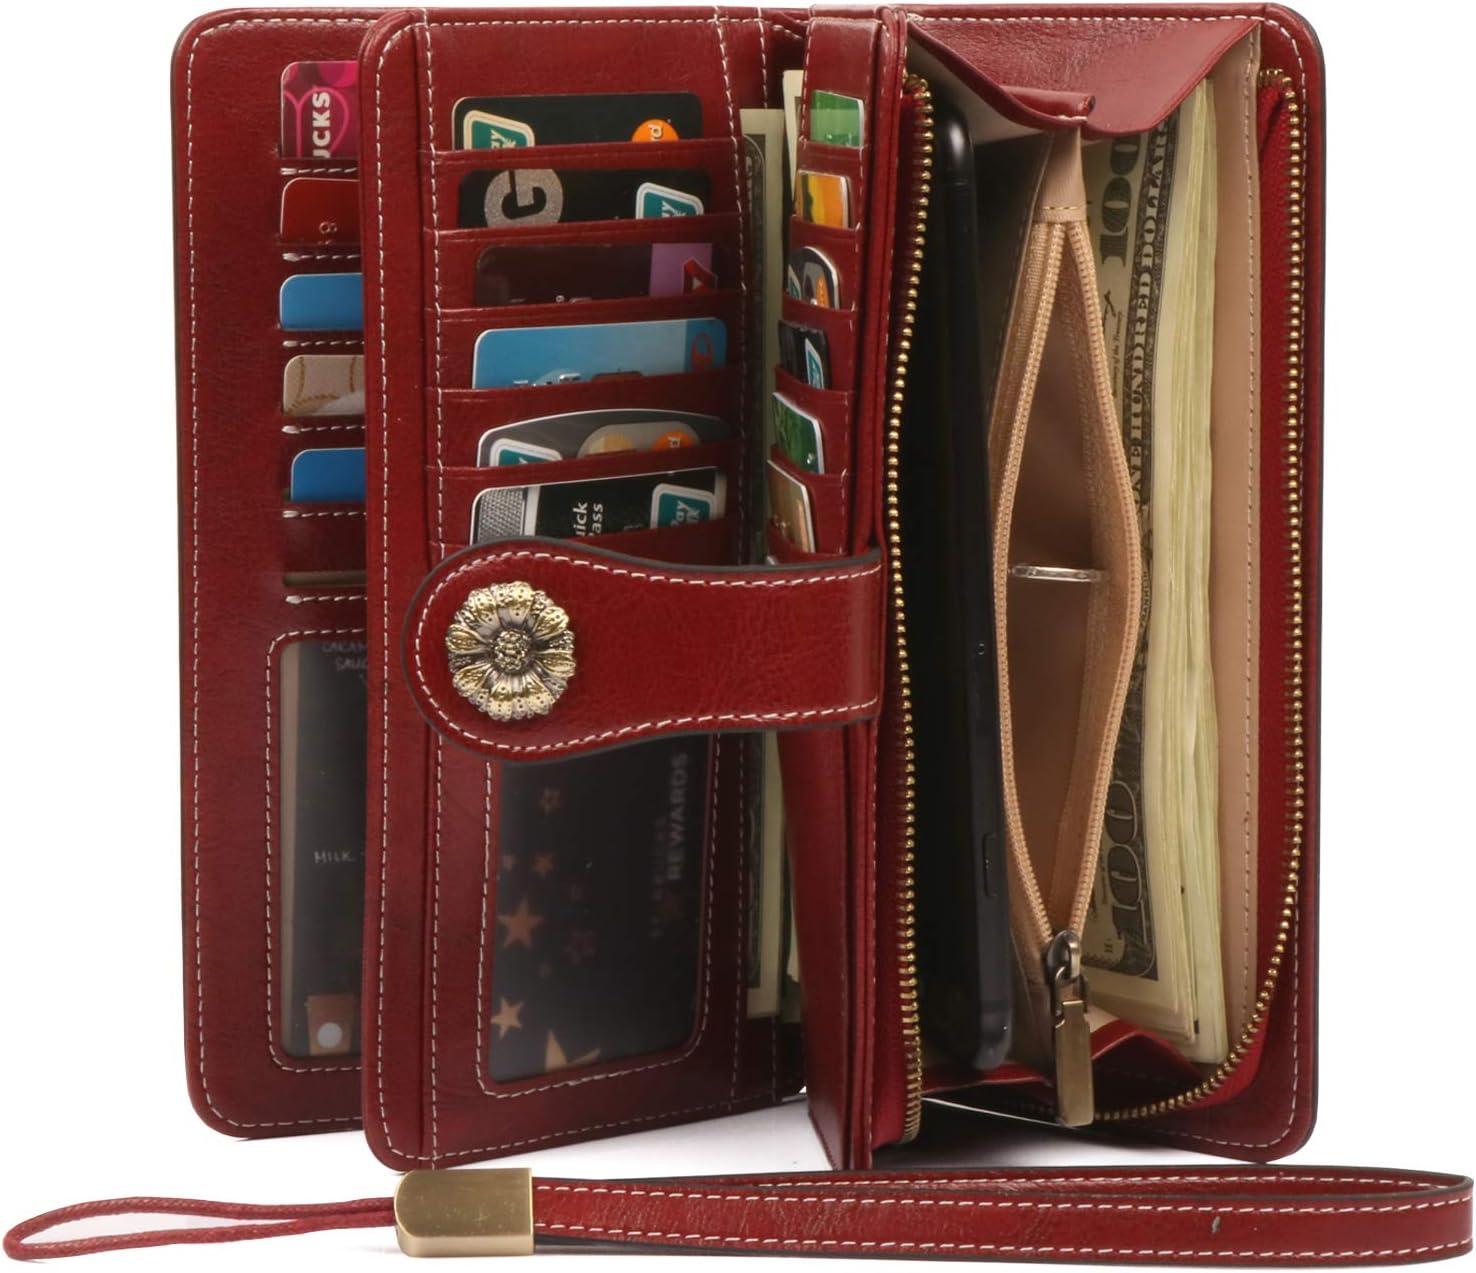 RFID Blocking Women Clutch Wallet Genuine Leather Long Wristlet Wallet Ladies Purse Credit Card Holder Coin Money Organizer Red